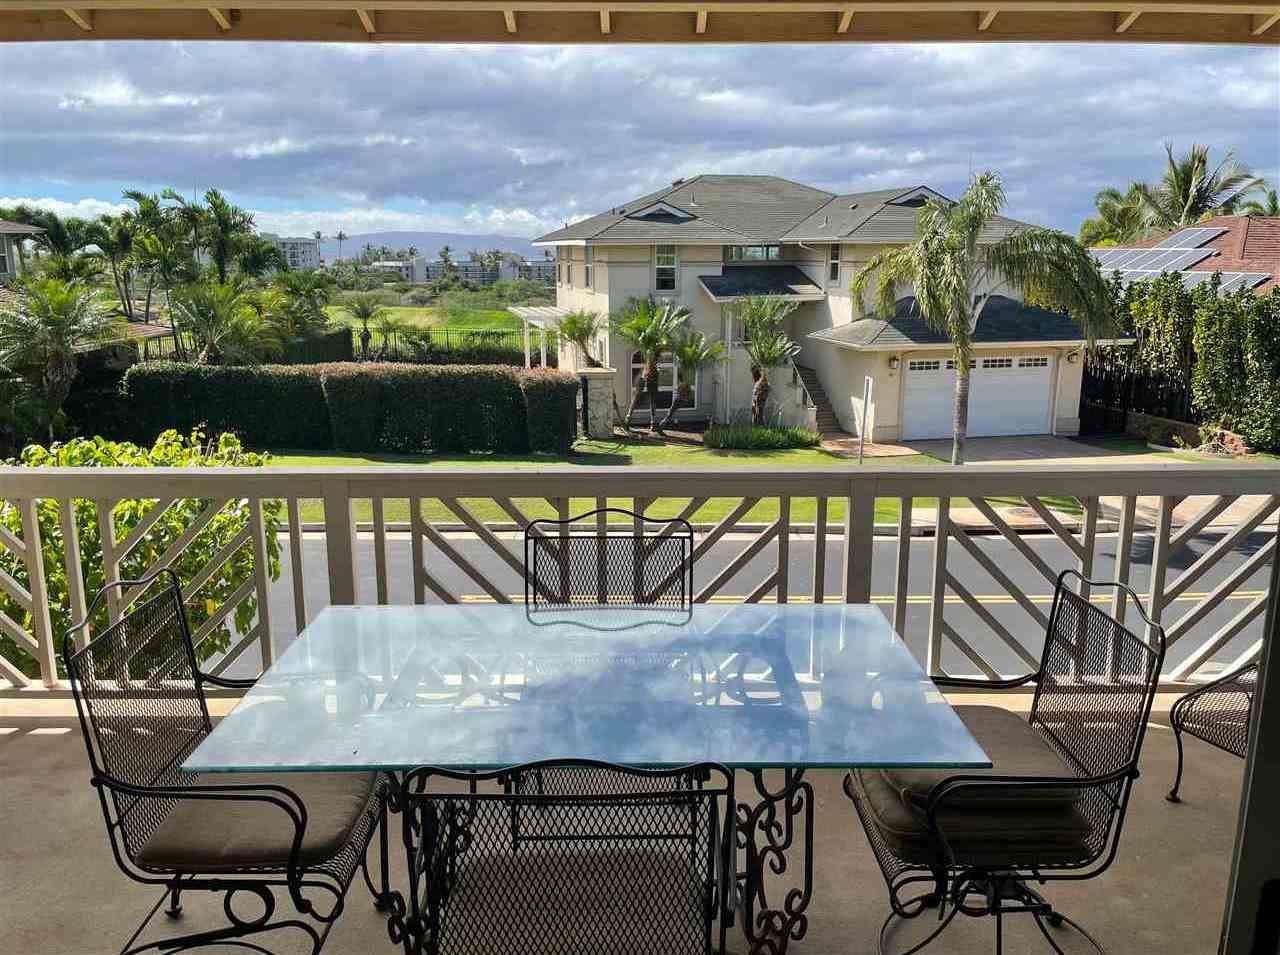 $1,299,000 - 4Br/4Ba -  for Sale in Moana Estates, Kihei